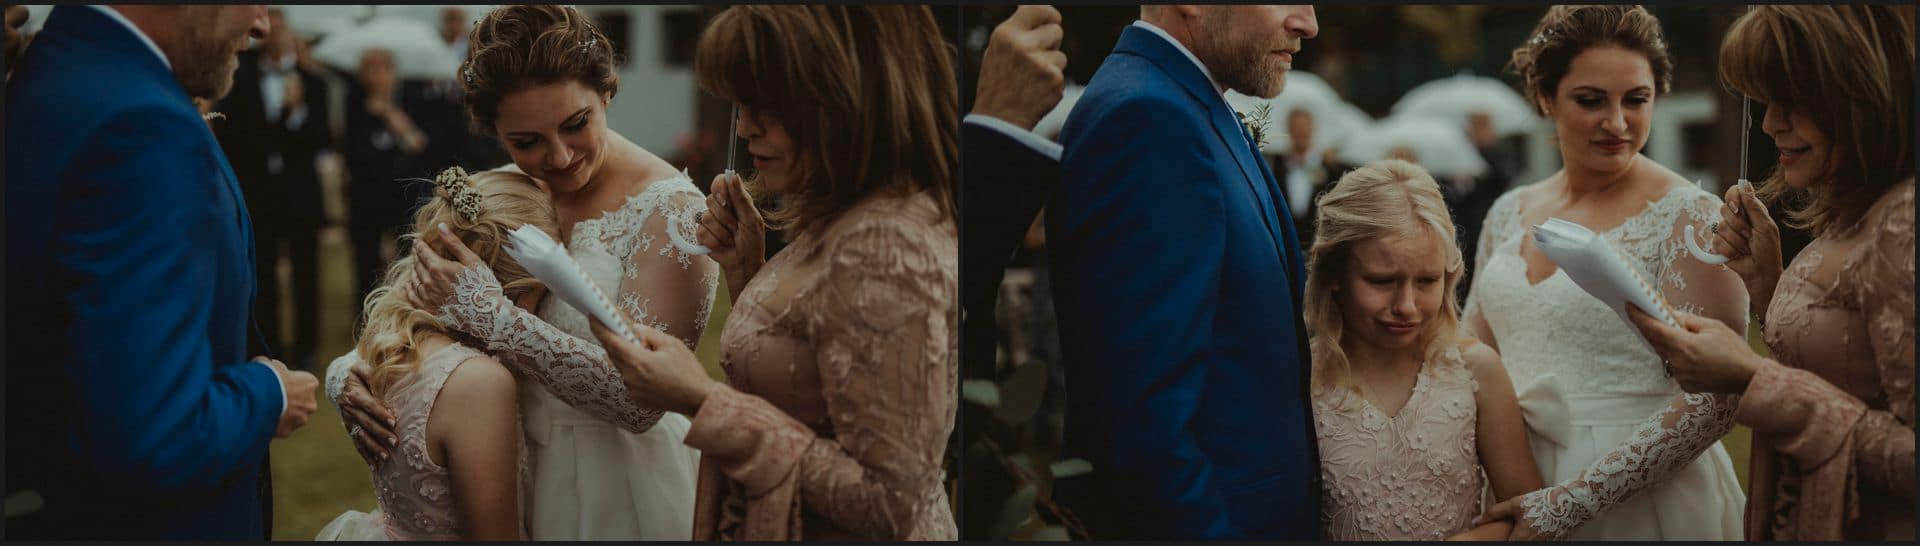 tuscany, destination wedding, chianti, wedding ceremony, bride, groom, daughter